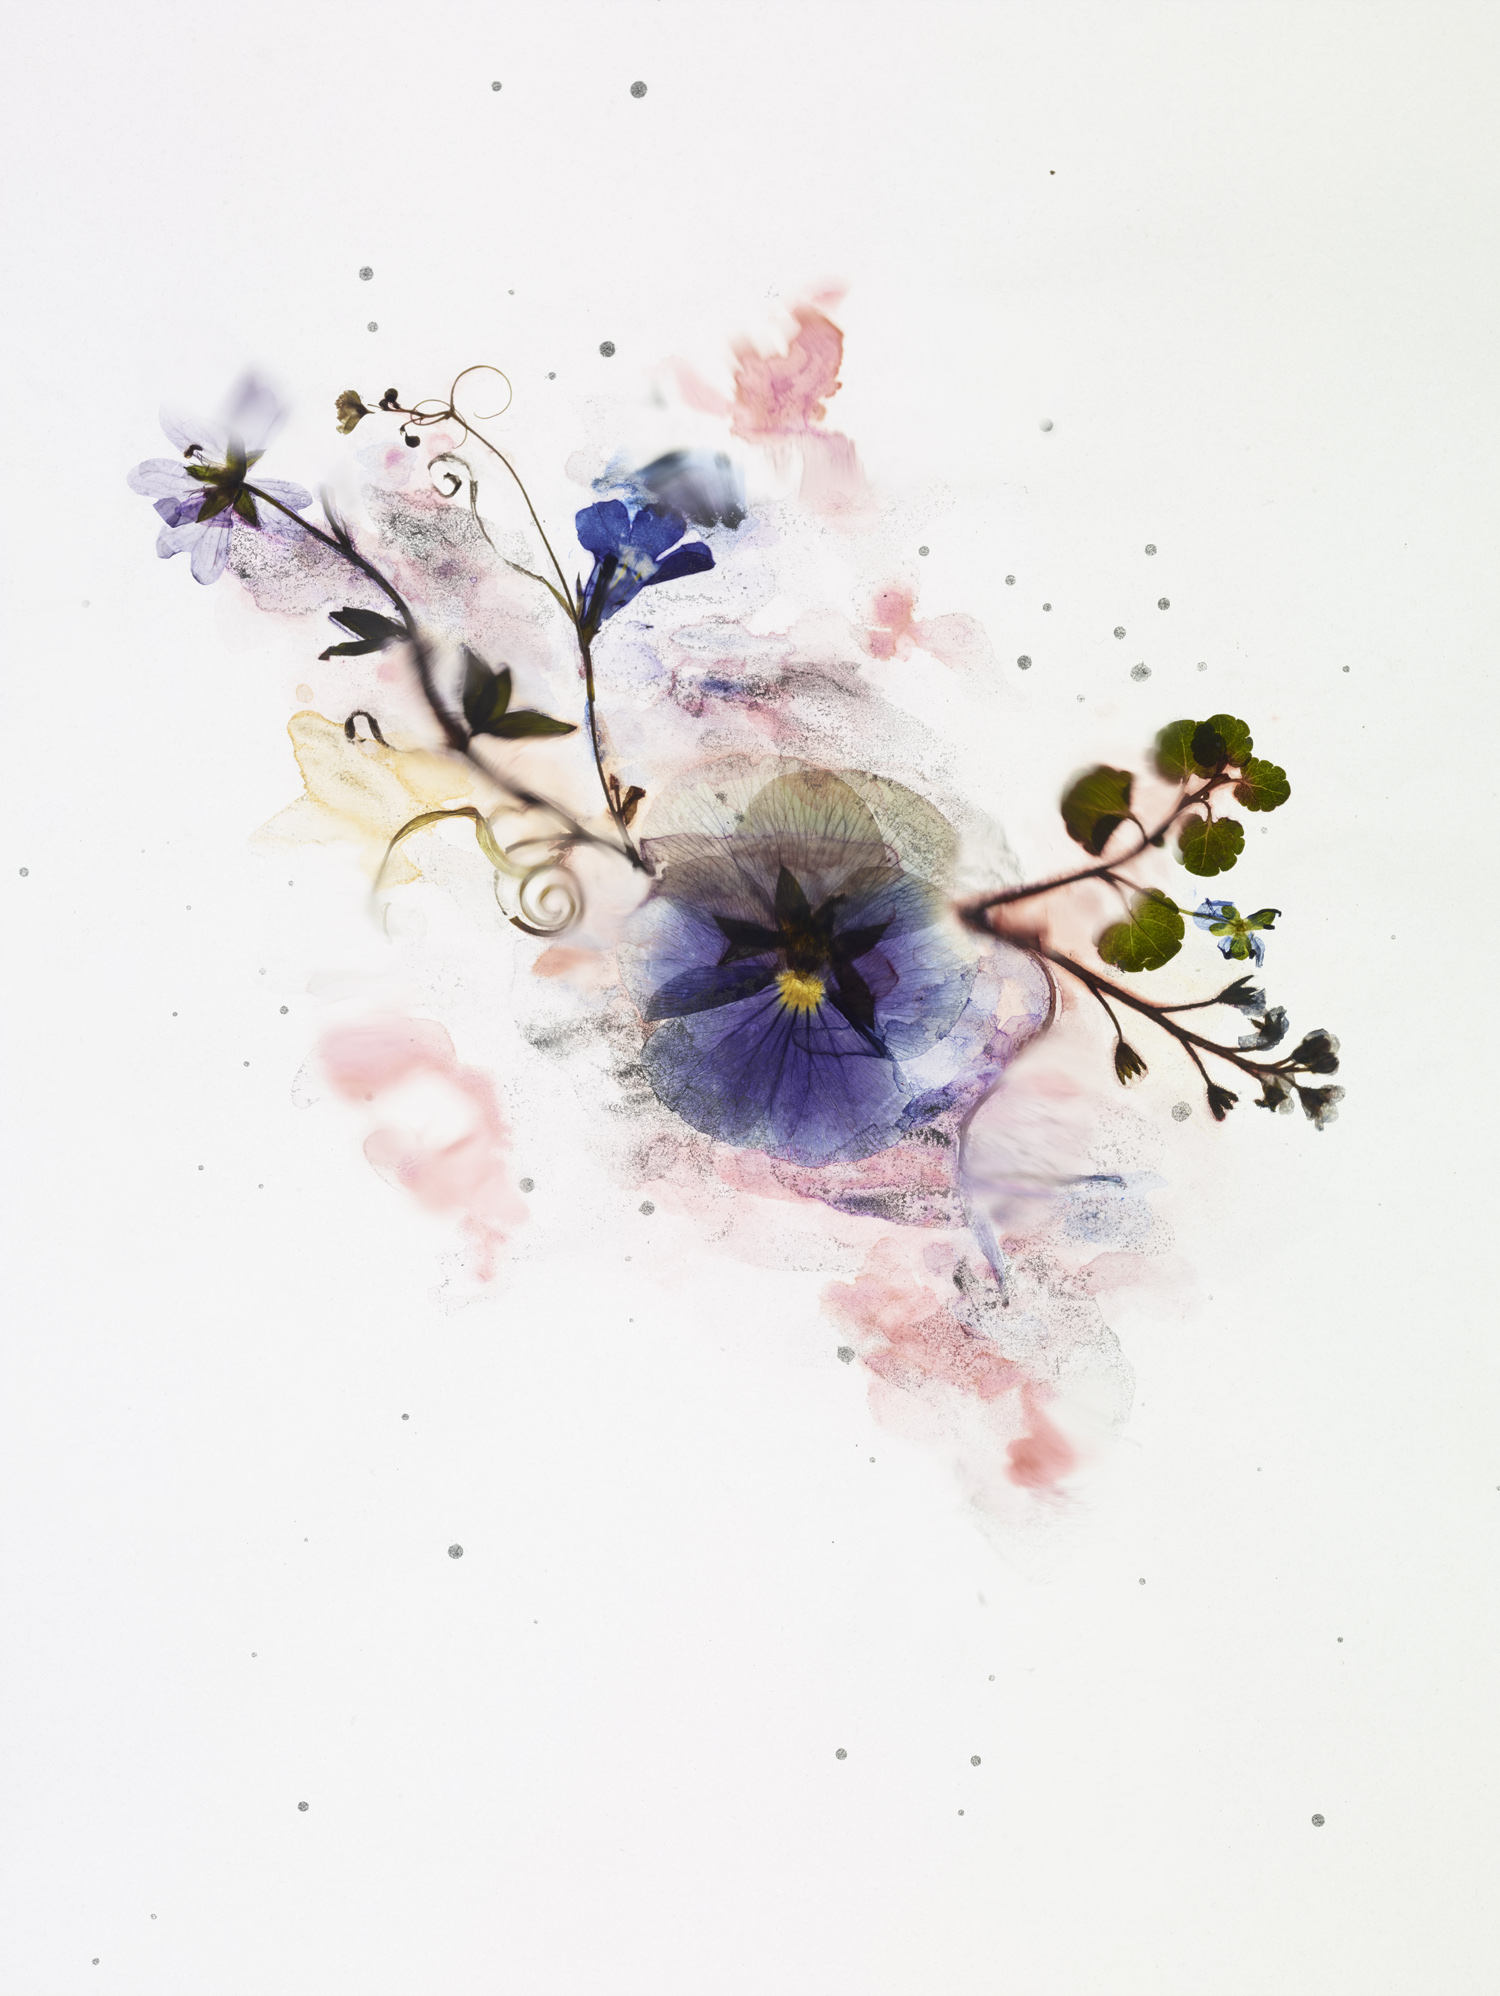 rf4201_dried_flower_test_s05_027